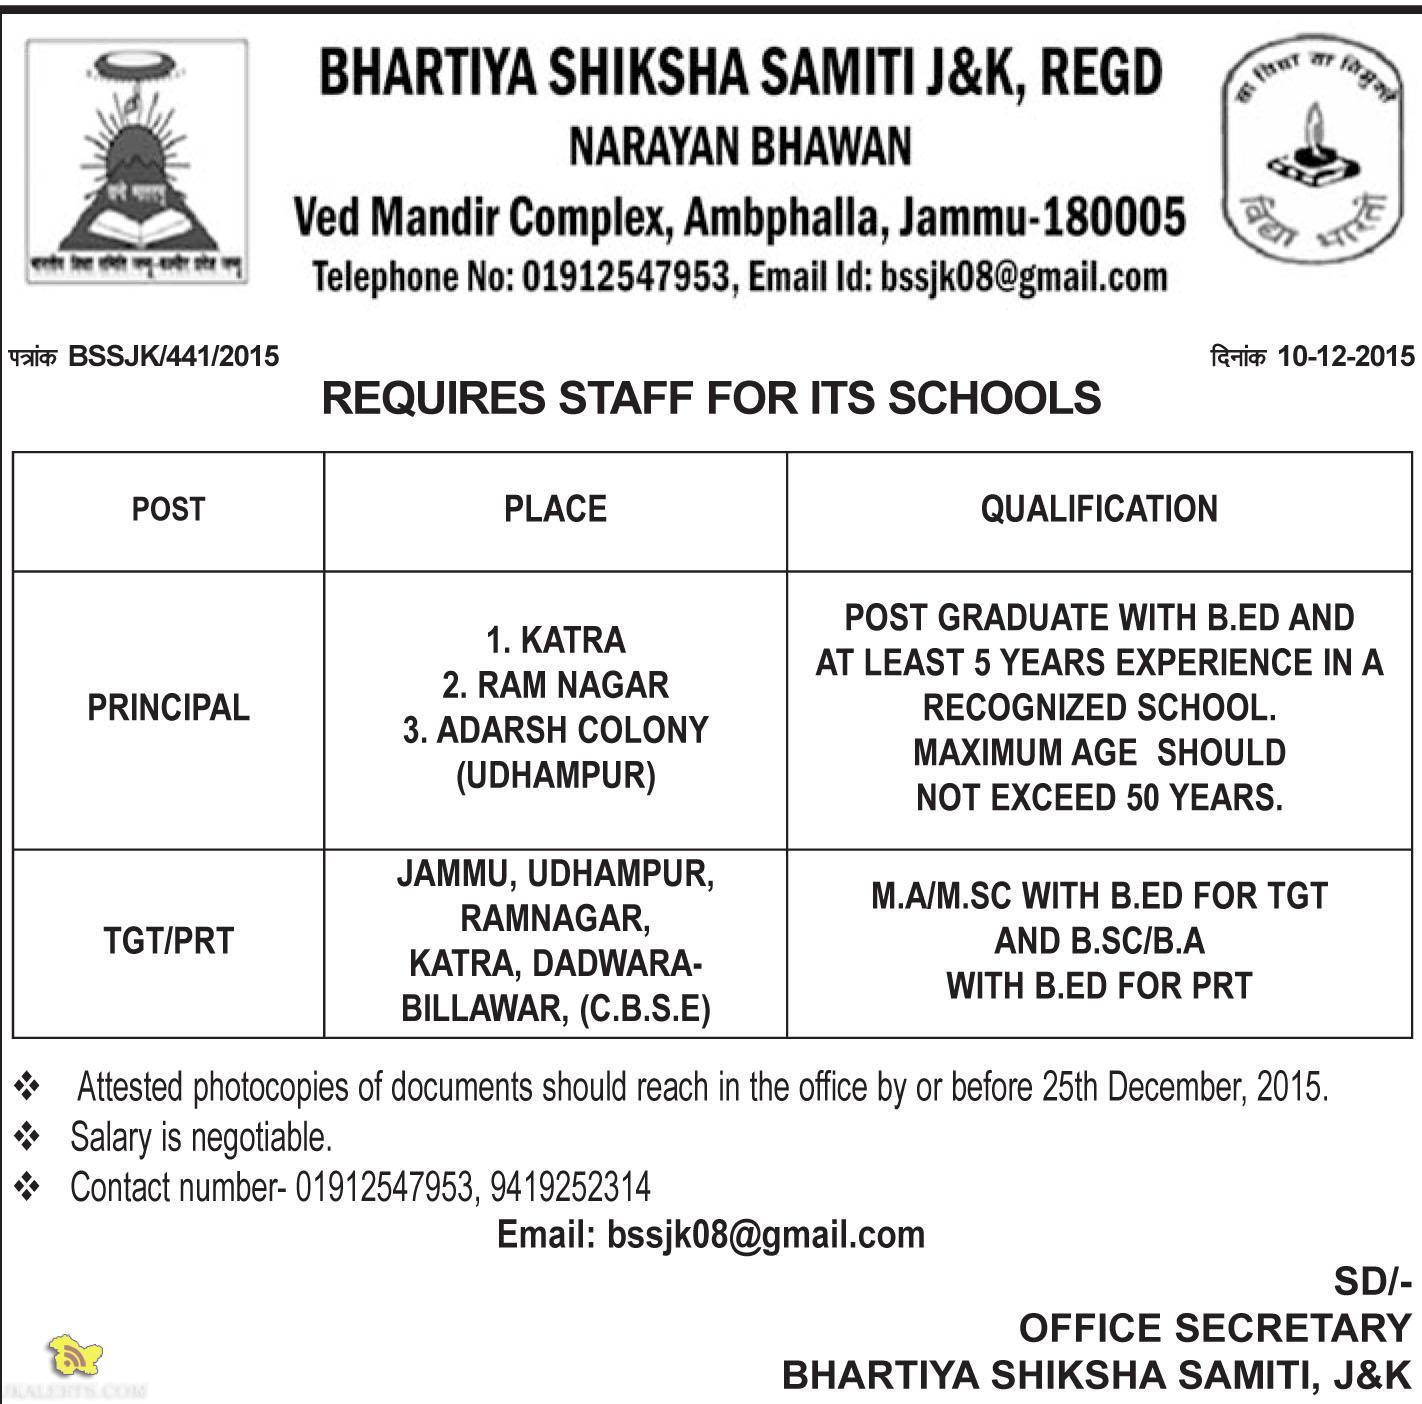 BHARTIYA SHIKSHA SAMITI J&K, REQUIRES STAFF FOR ITS SCHOOLS